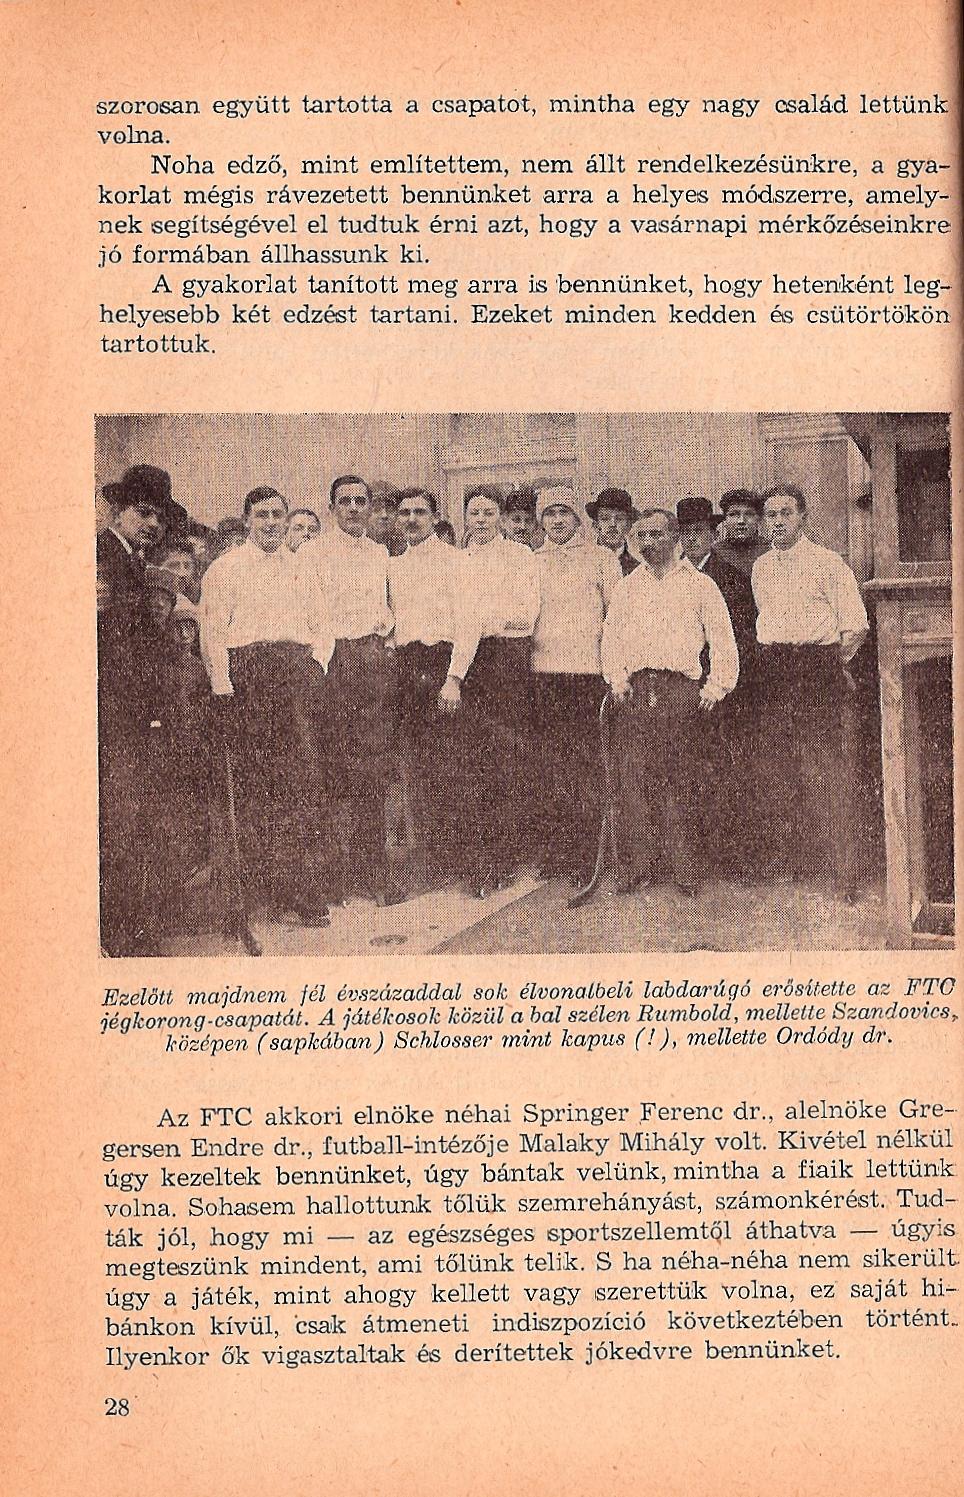 schlosser_fel-evszazad_1957_28_1020